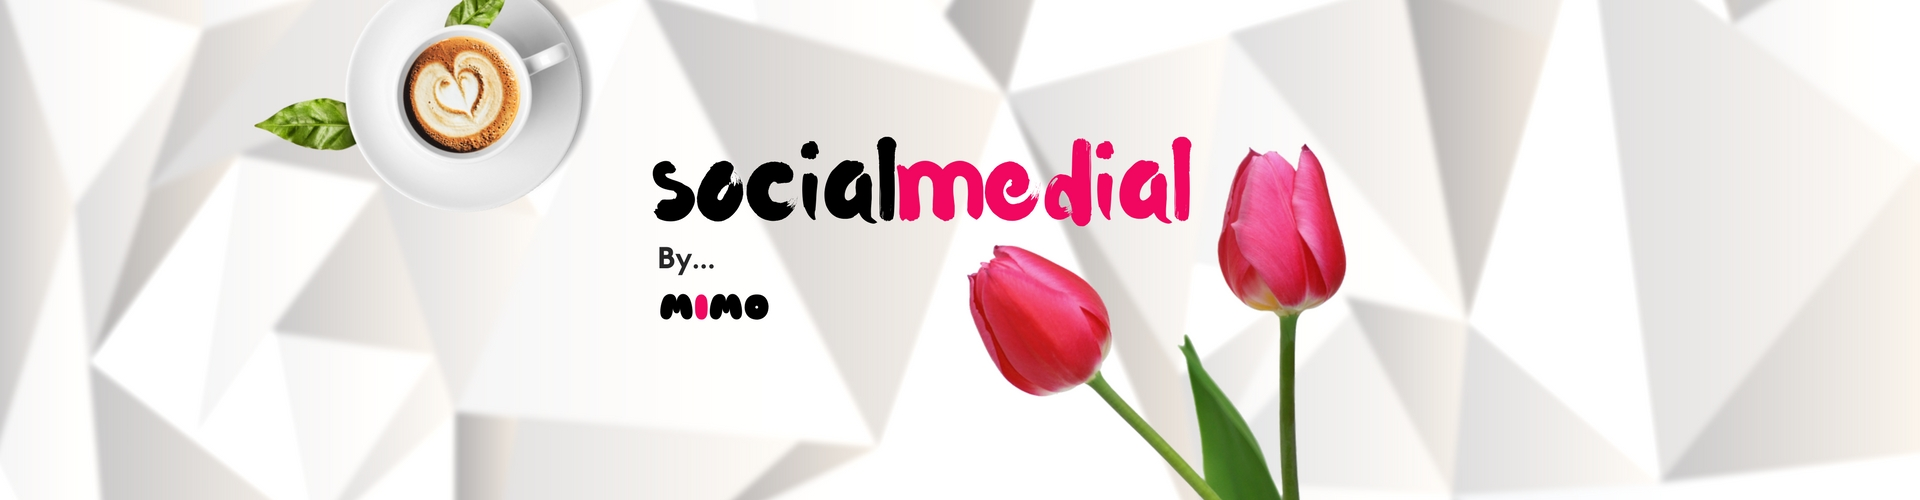 Agencja social media łódź